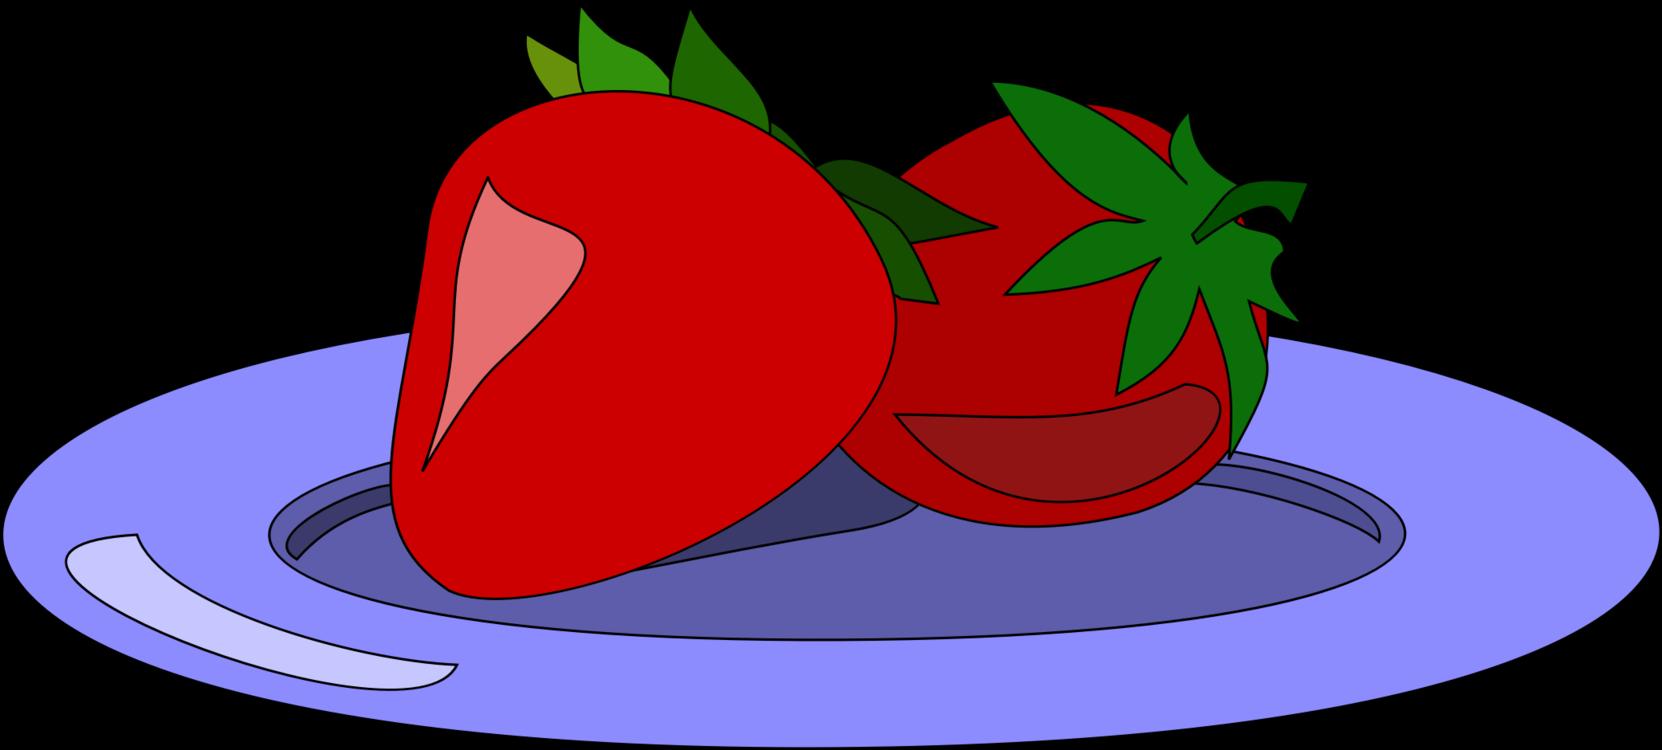 Plant,Flower,Food